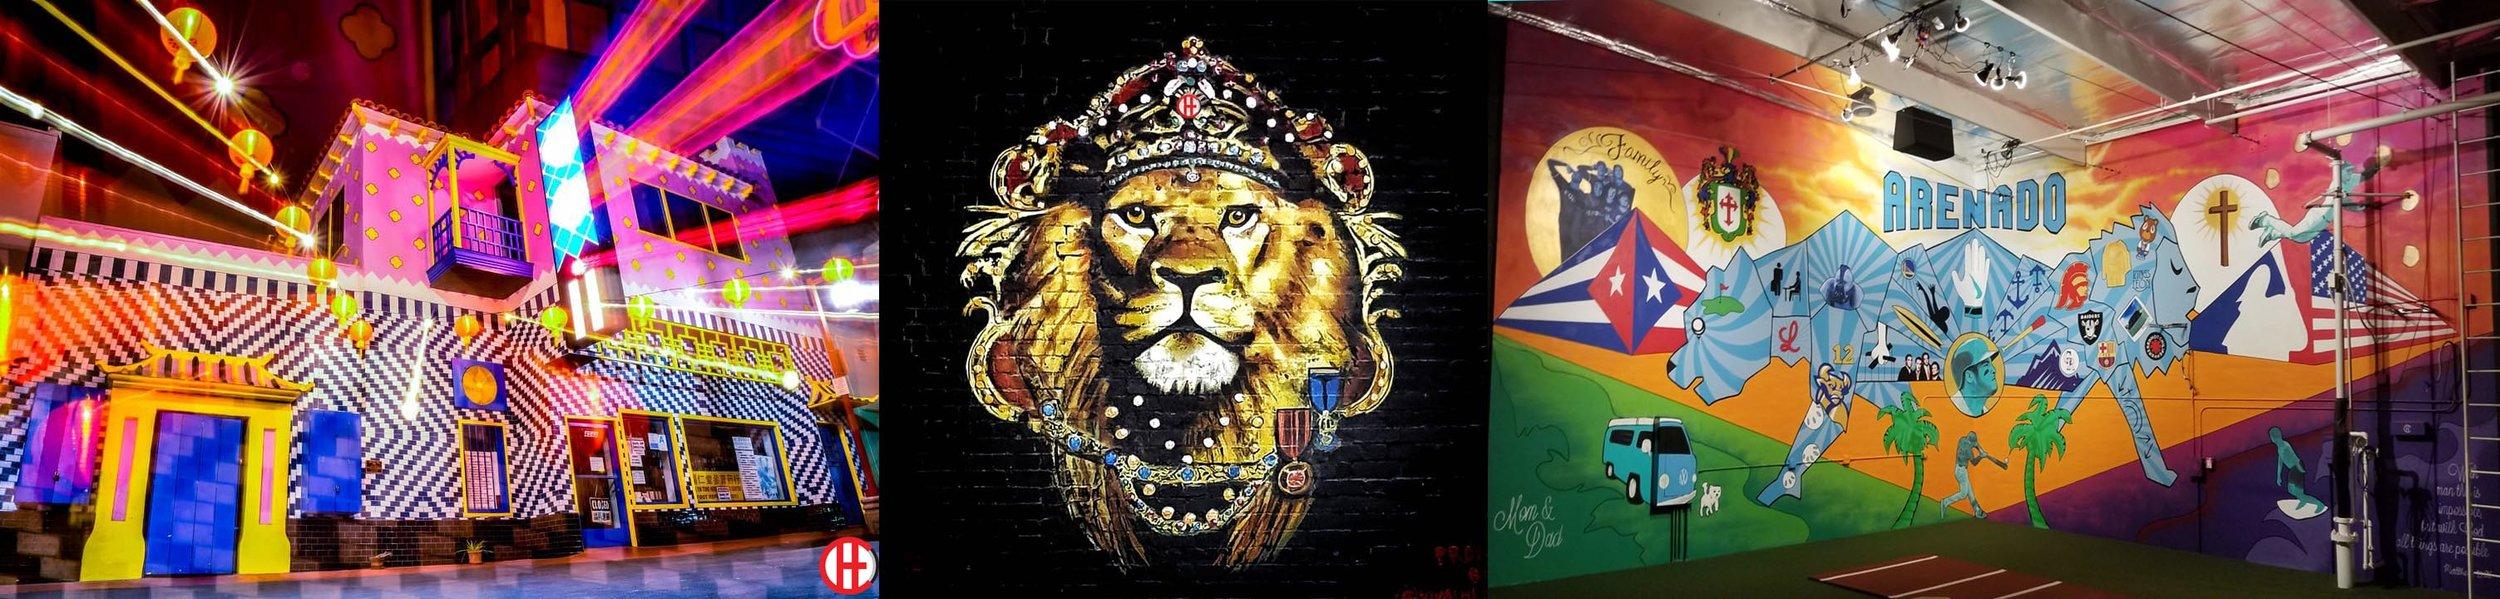 mural painter muralist mural artist vivache designs.jpg